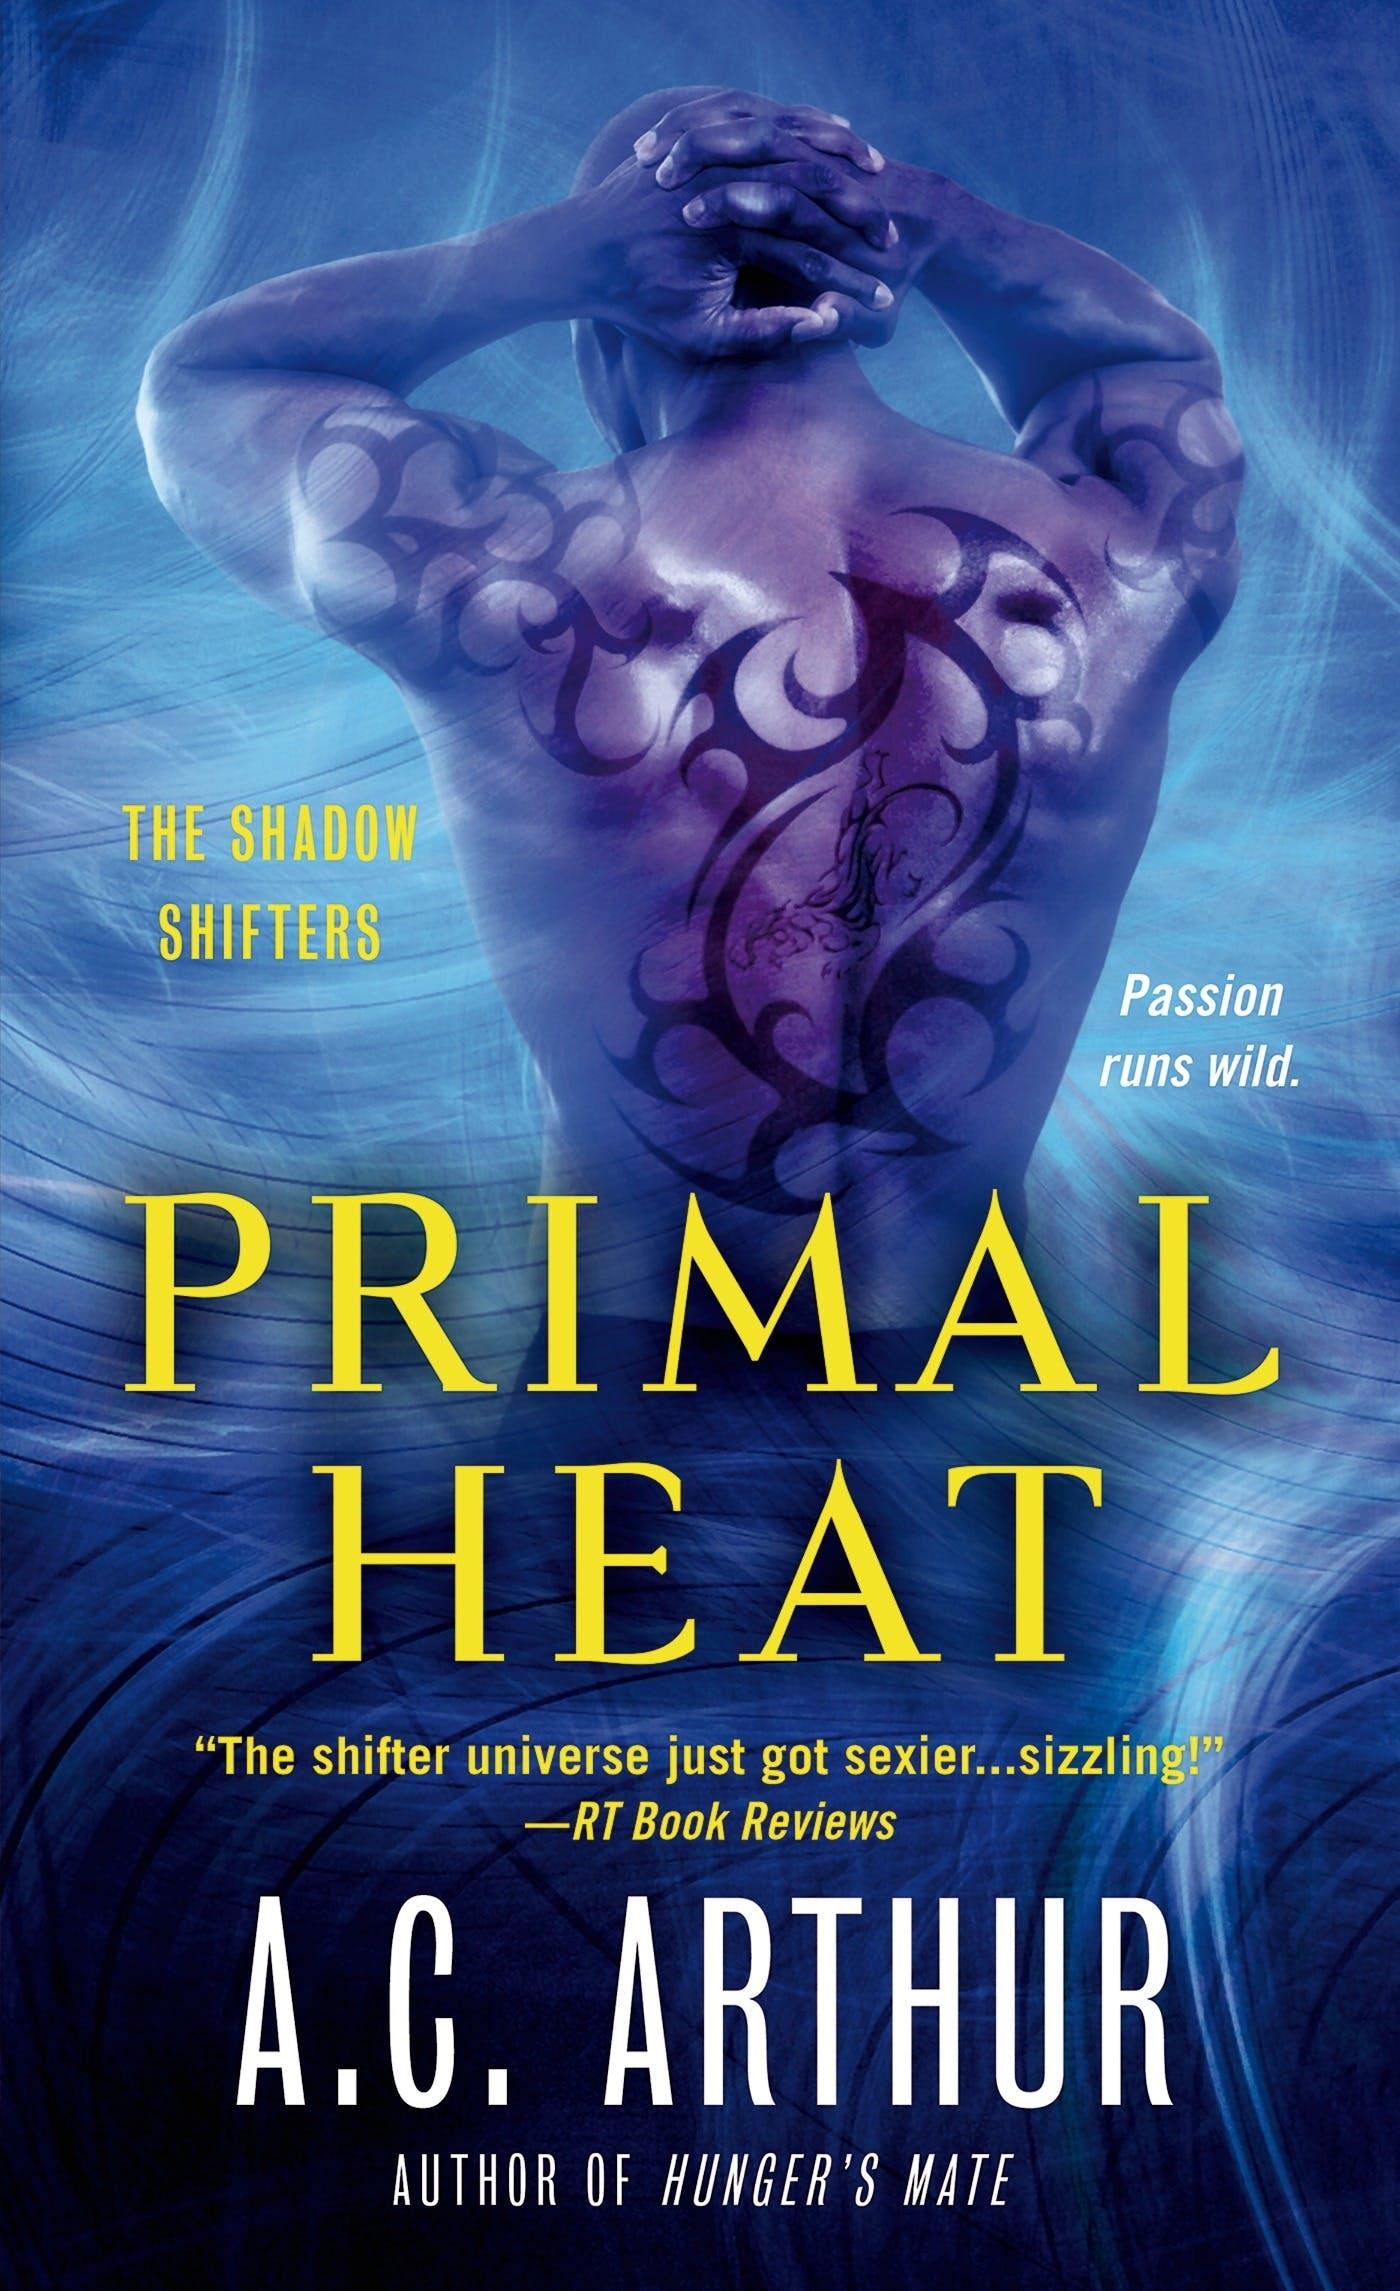 Image of Primal Heat